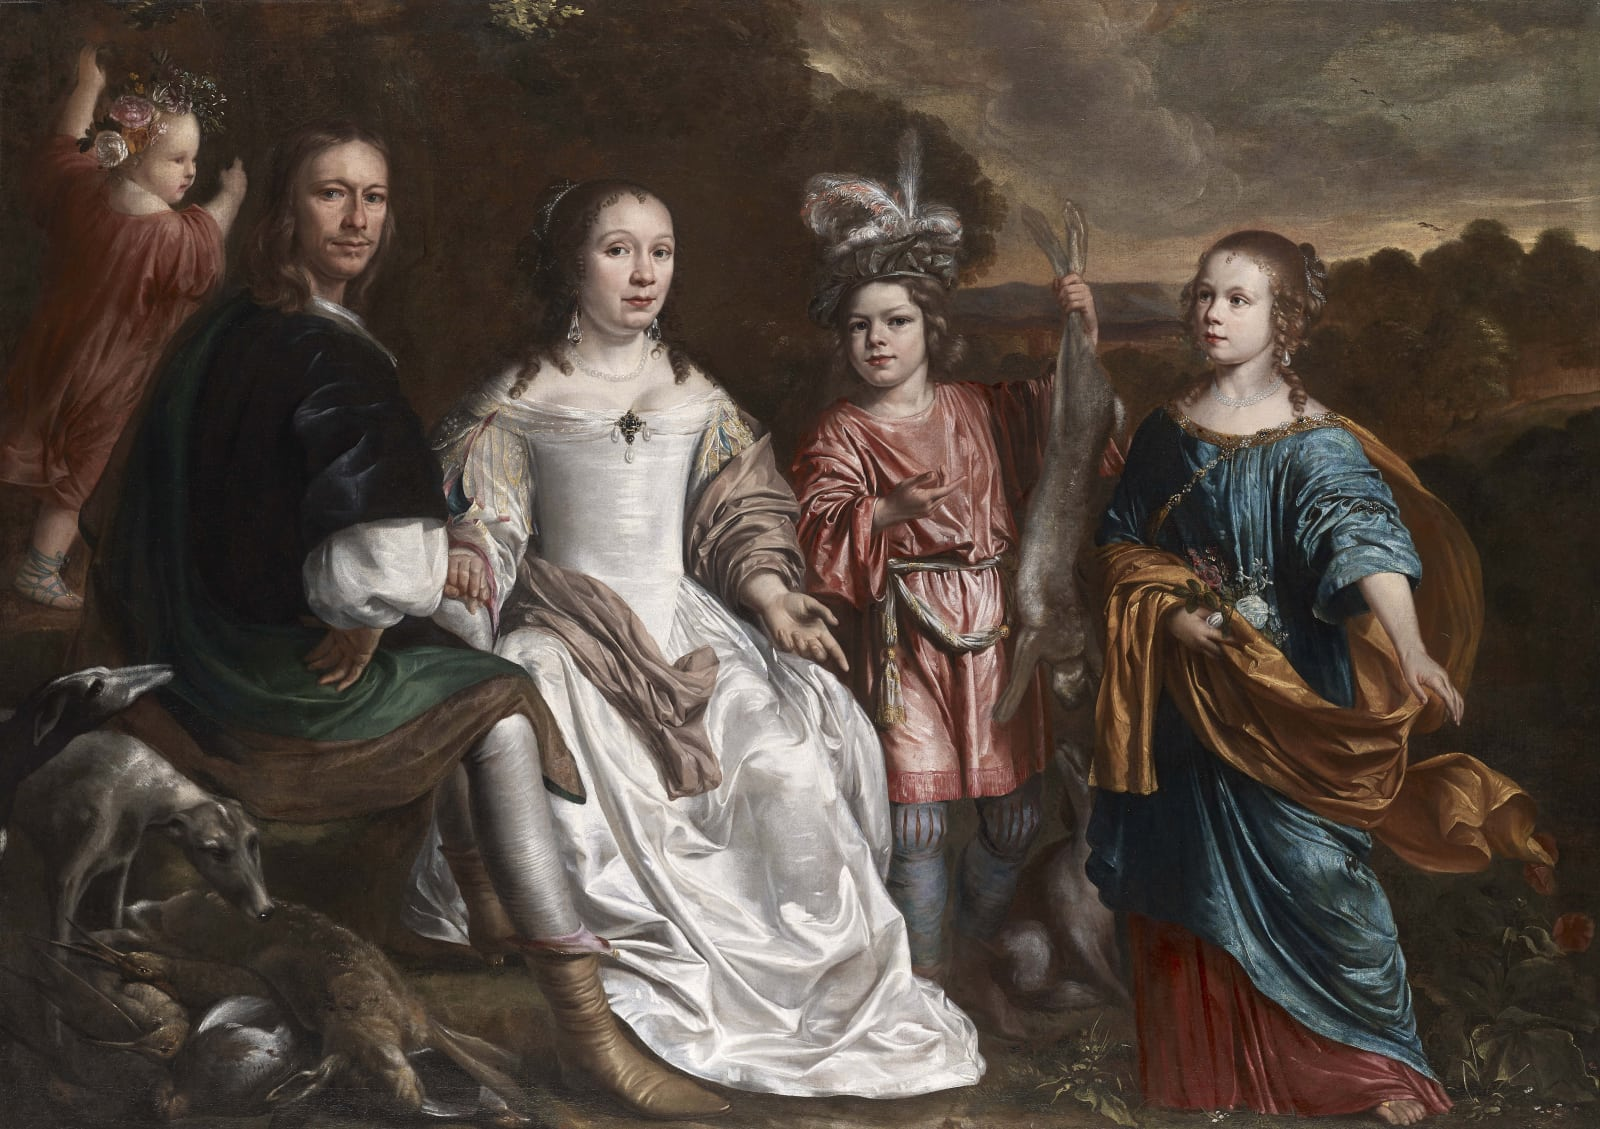 A family group, presumably from Zeeland